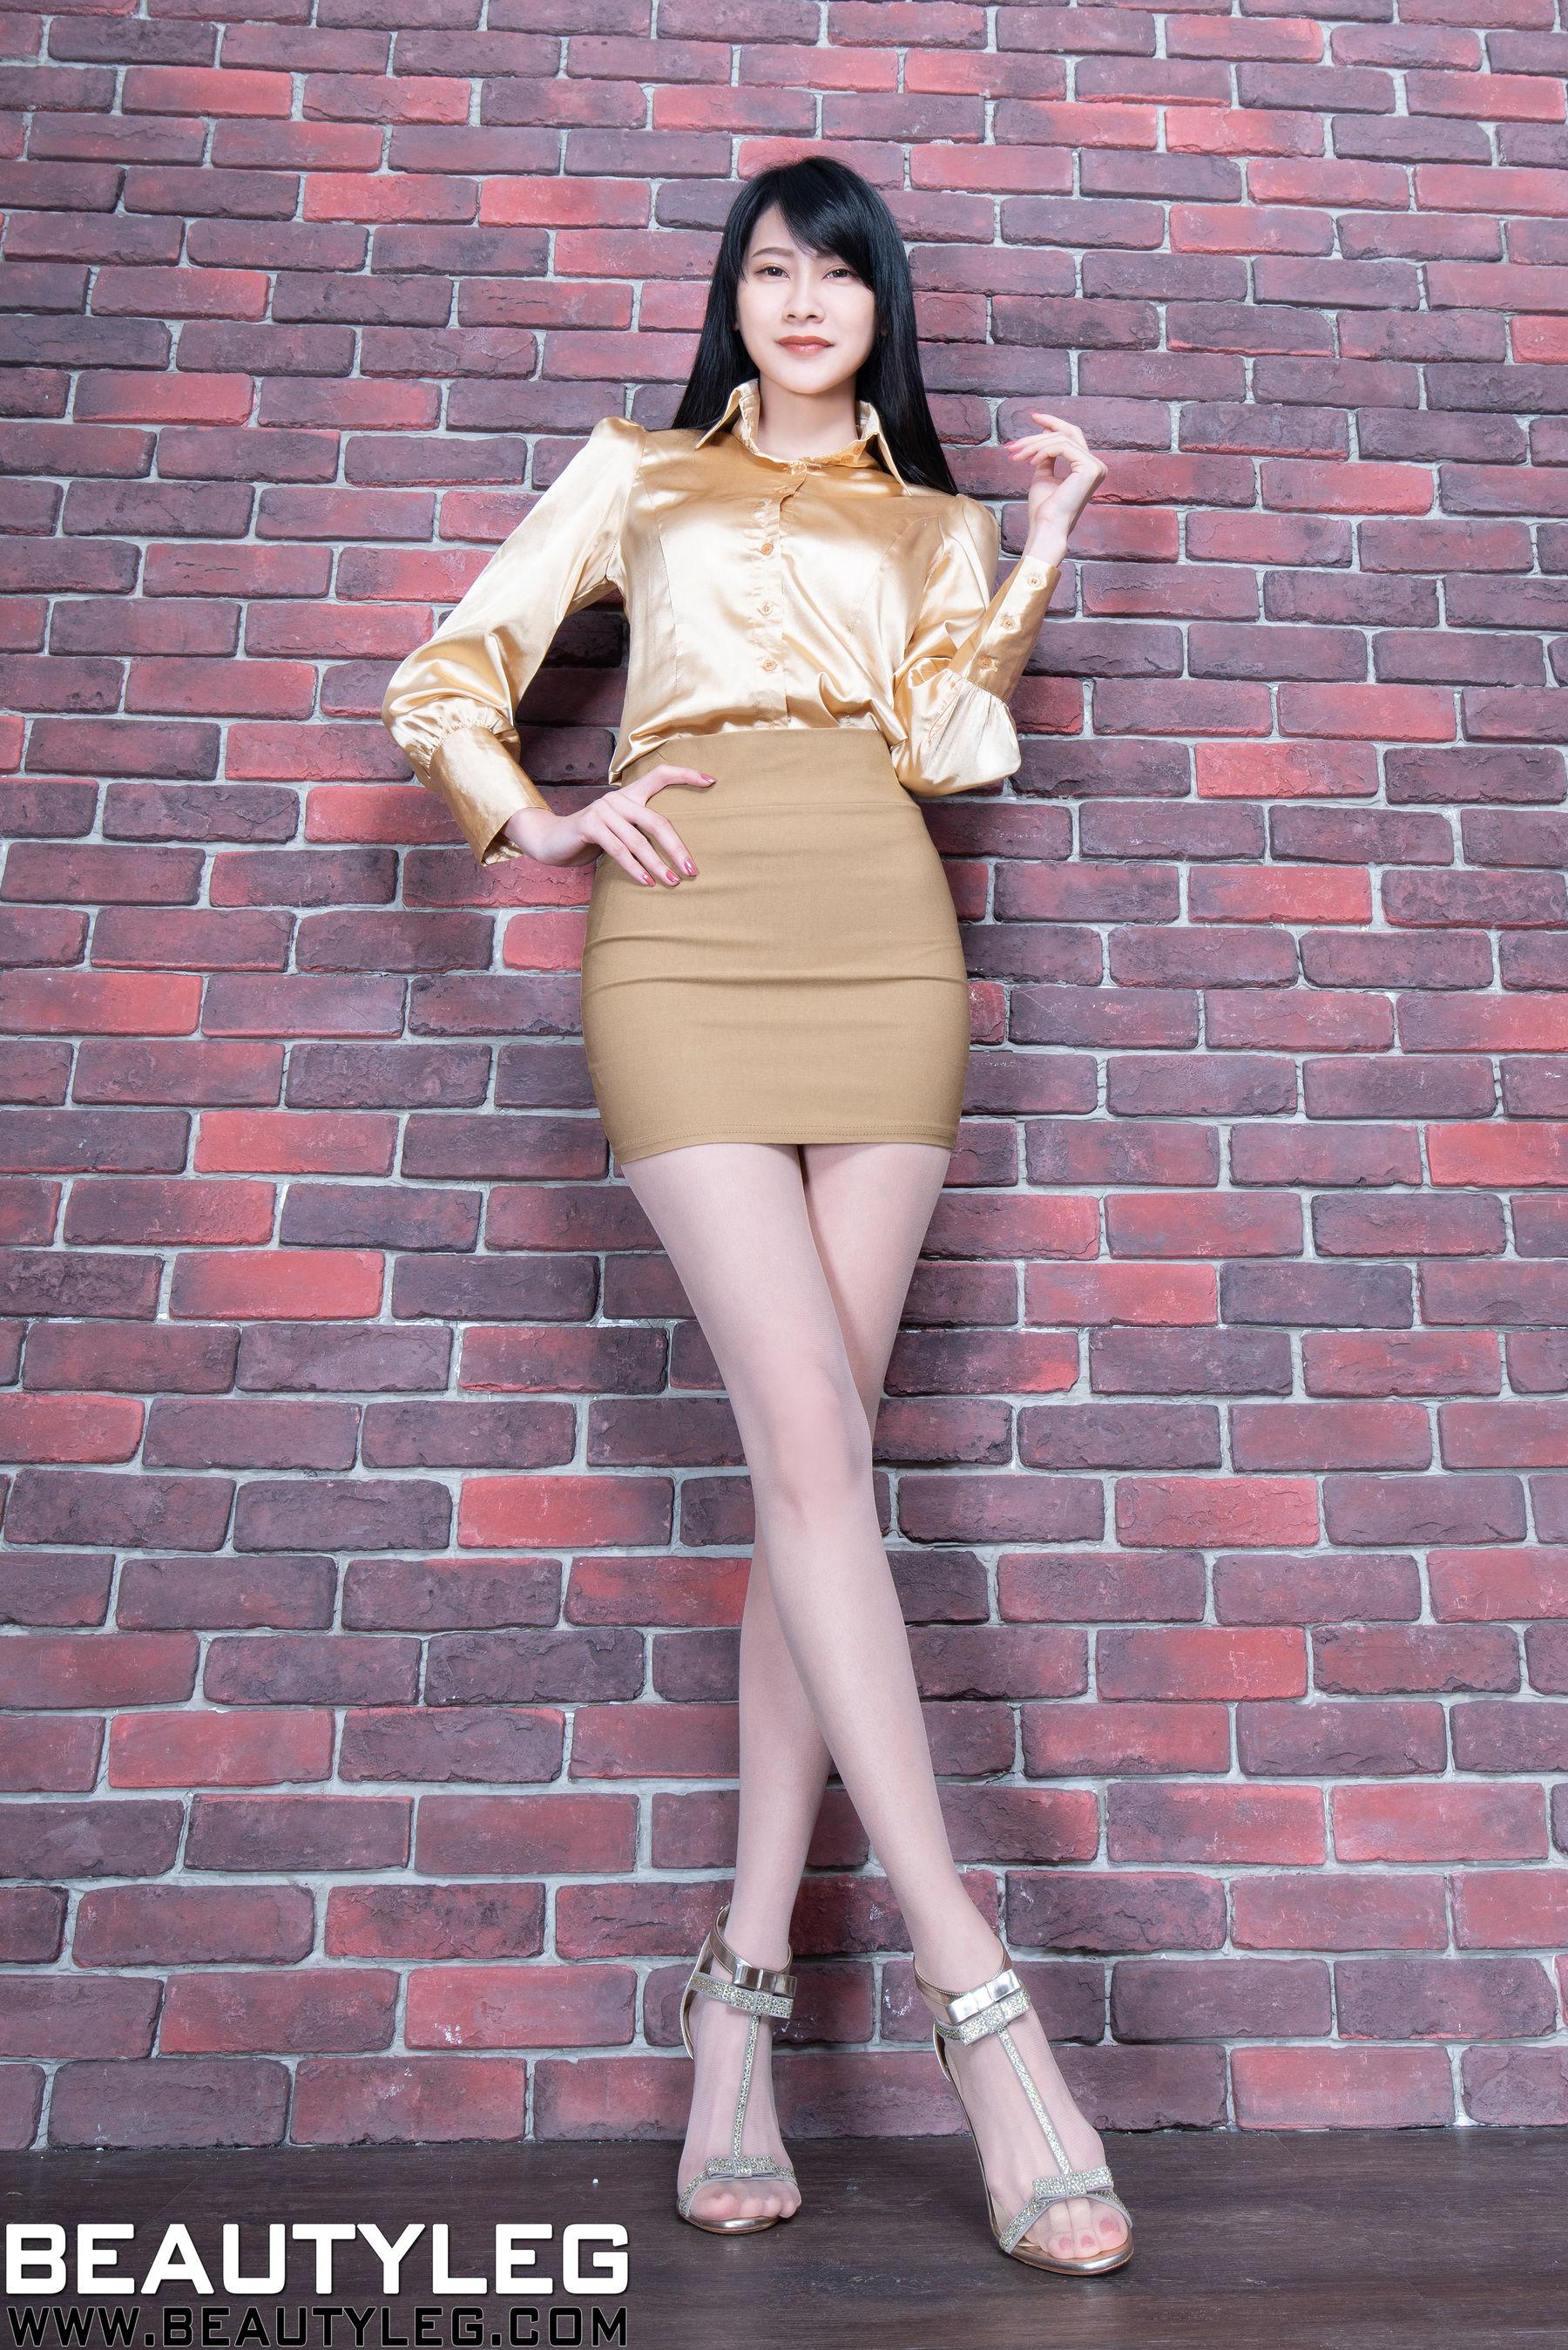 VOL.1792 [Beautyleg]丝袜美女高跟包臀裙美女:腿模Jing(Beautyleg Jing)超高清个人性感漂亮大图(68P)